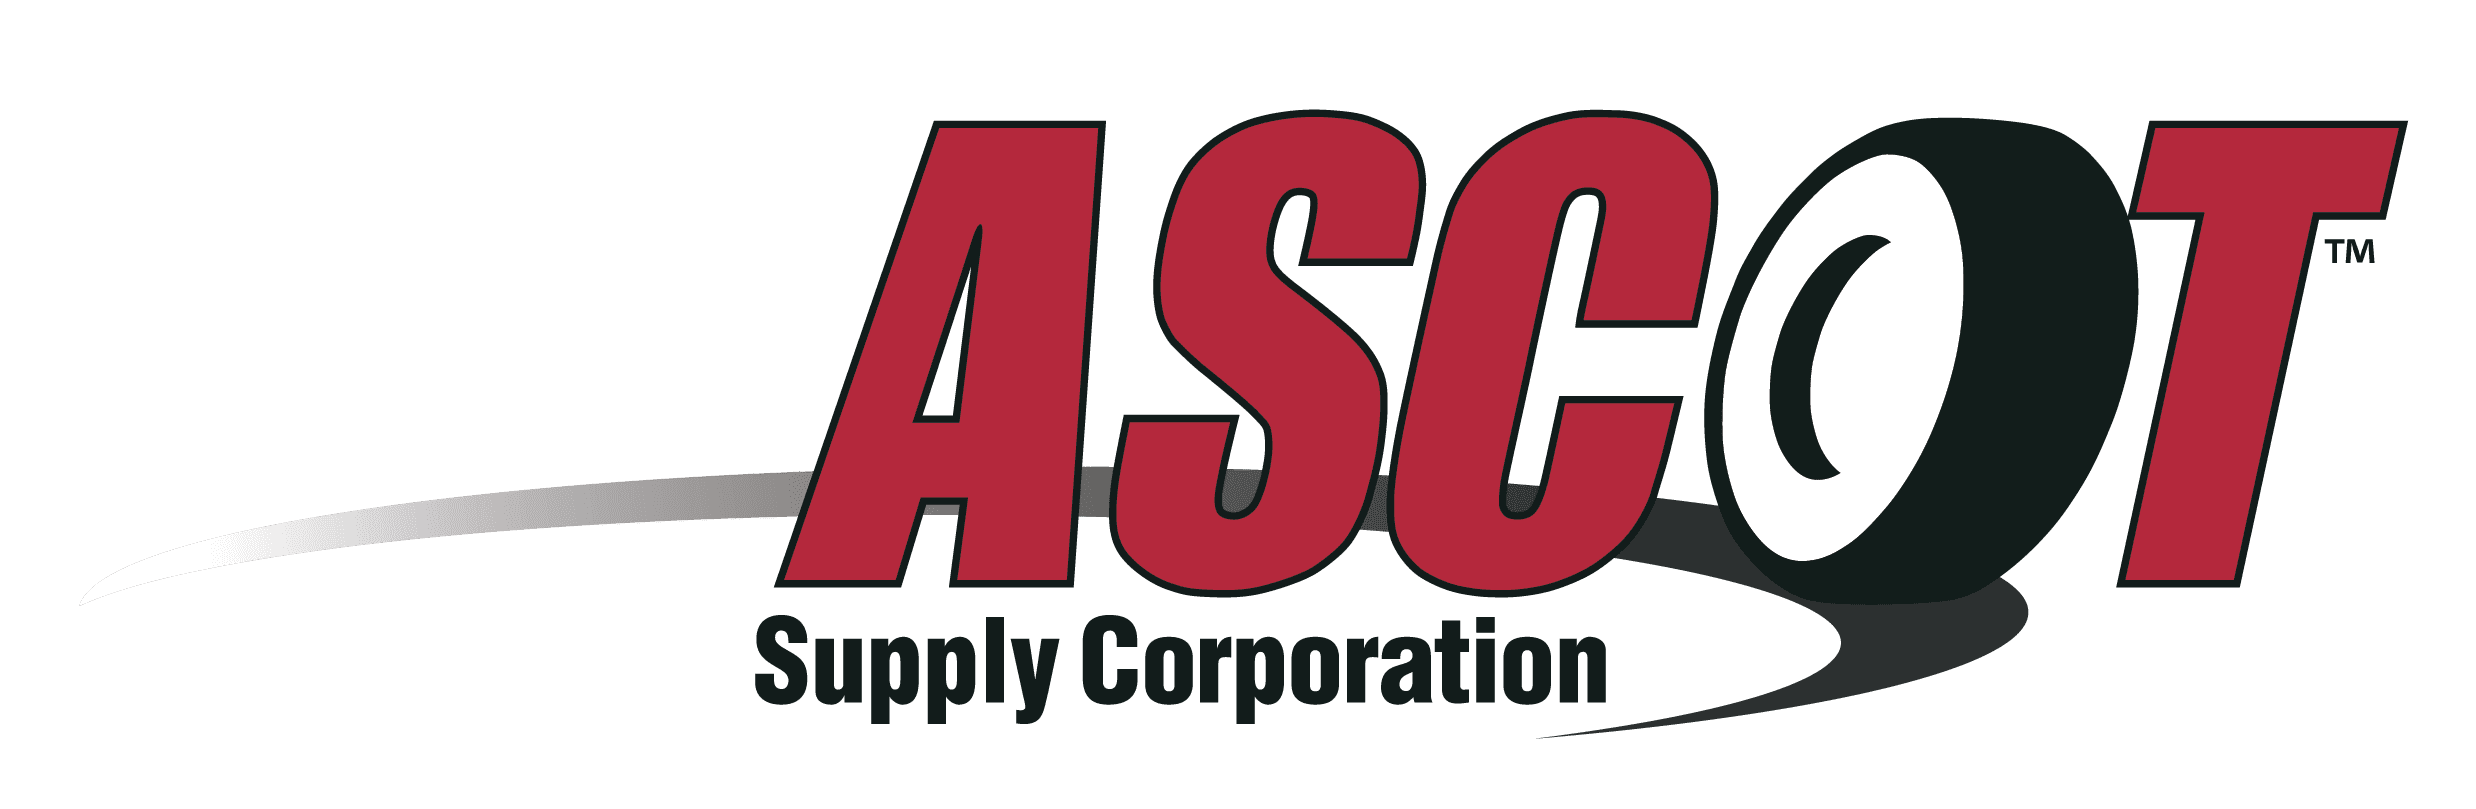 https://www.buytsi.com/wp-content/uploads/2021/01/Ascot-Logo_original-01.png